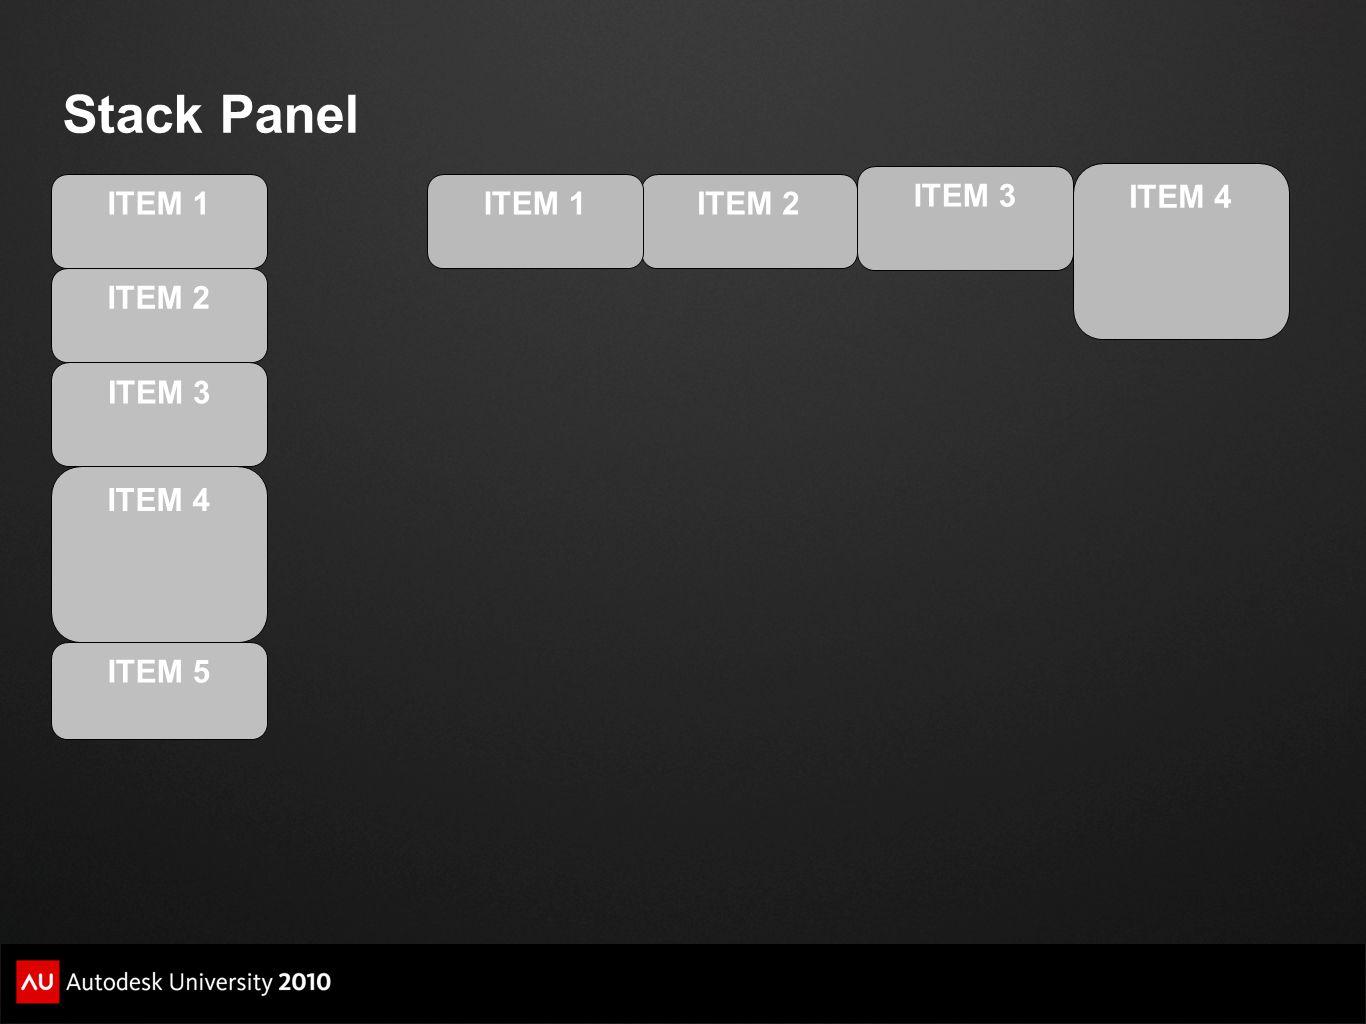 Stack Panel ITEM 3 ITEM 4 ITEM 1 ITEM 1 ITEM 2 ITEM 2 ITEM 3 ITEM 4